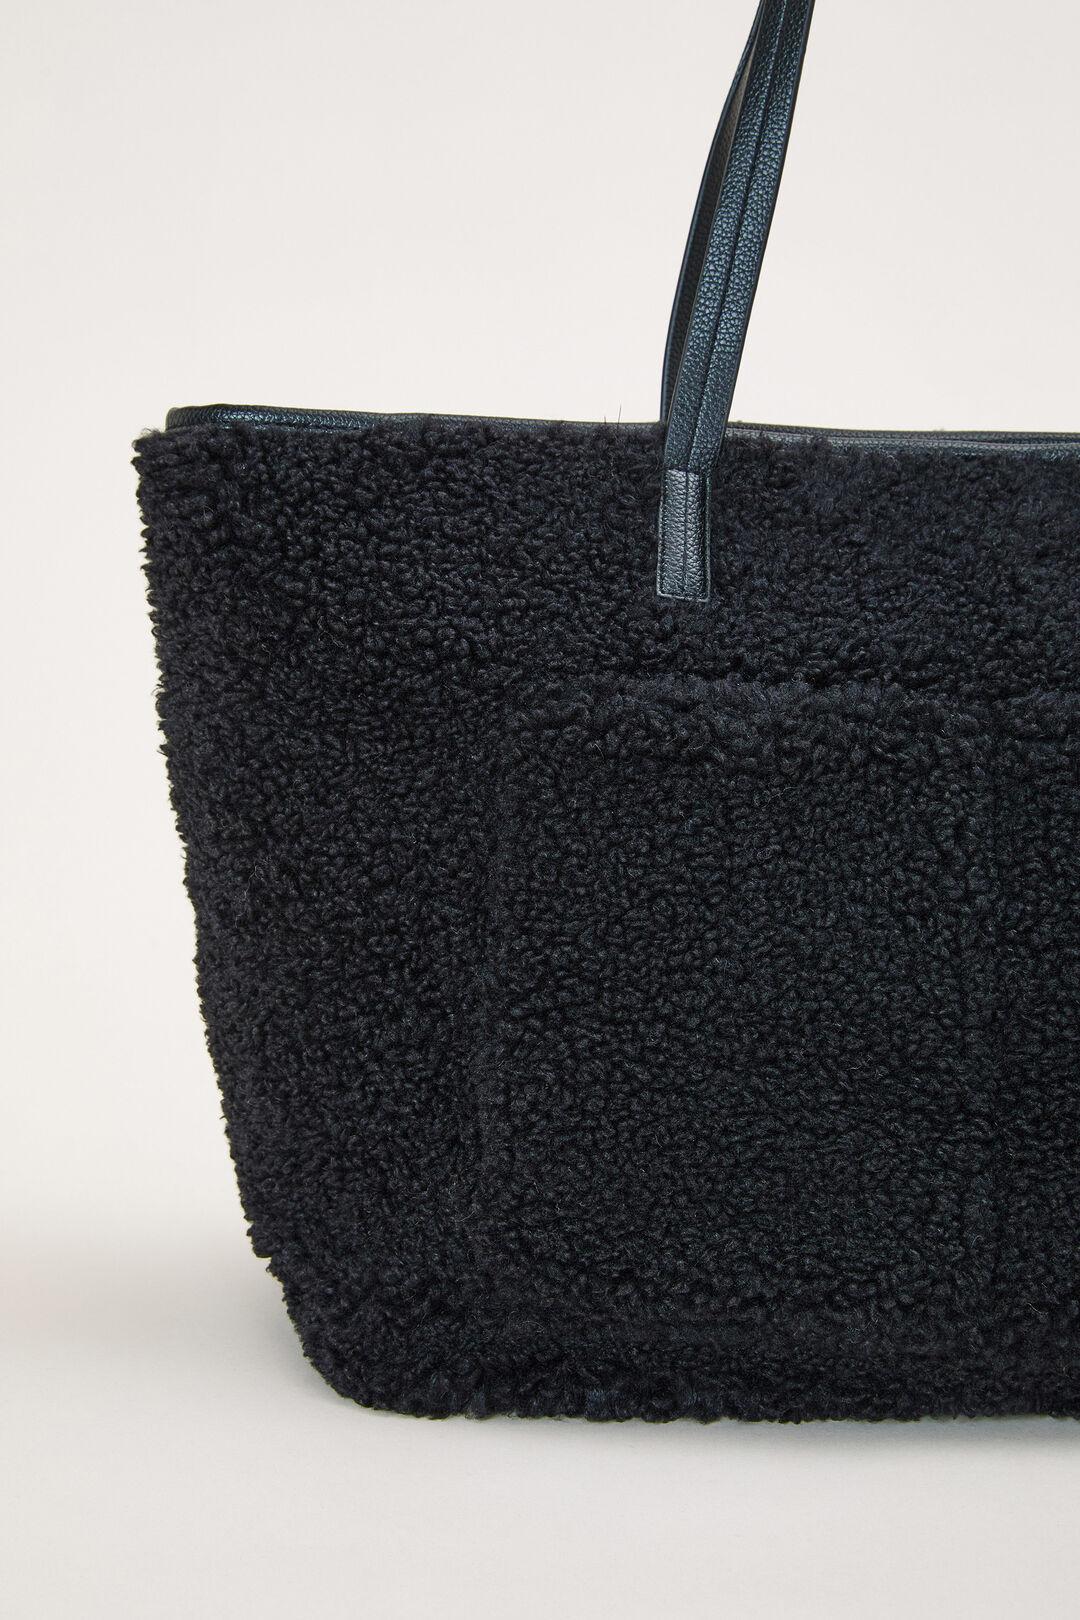 TEDDY TOTE BAG  BLACK  hi-res